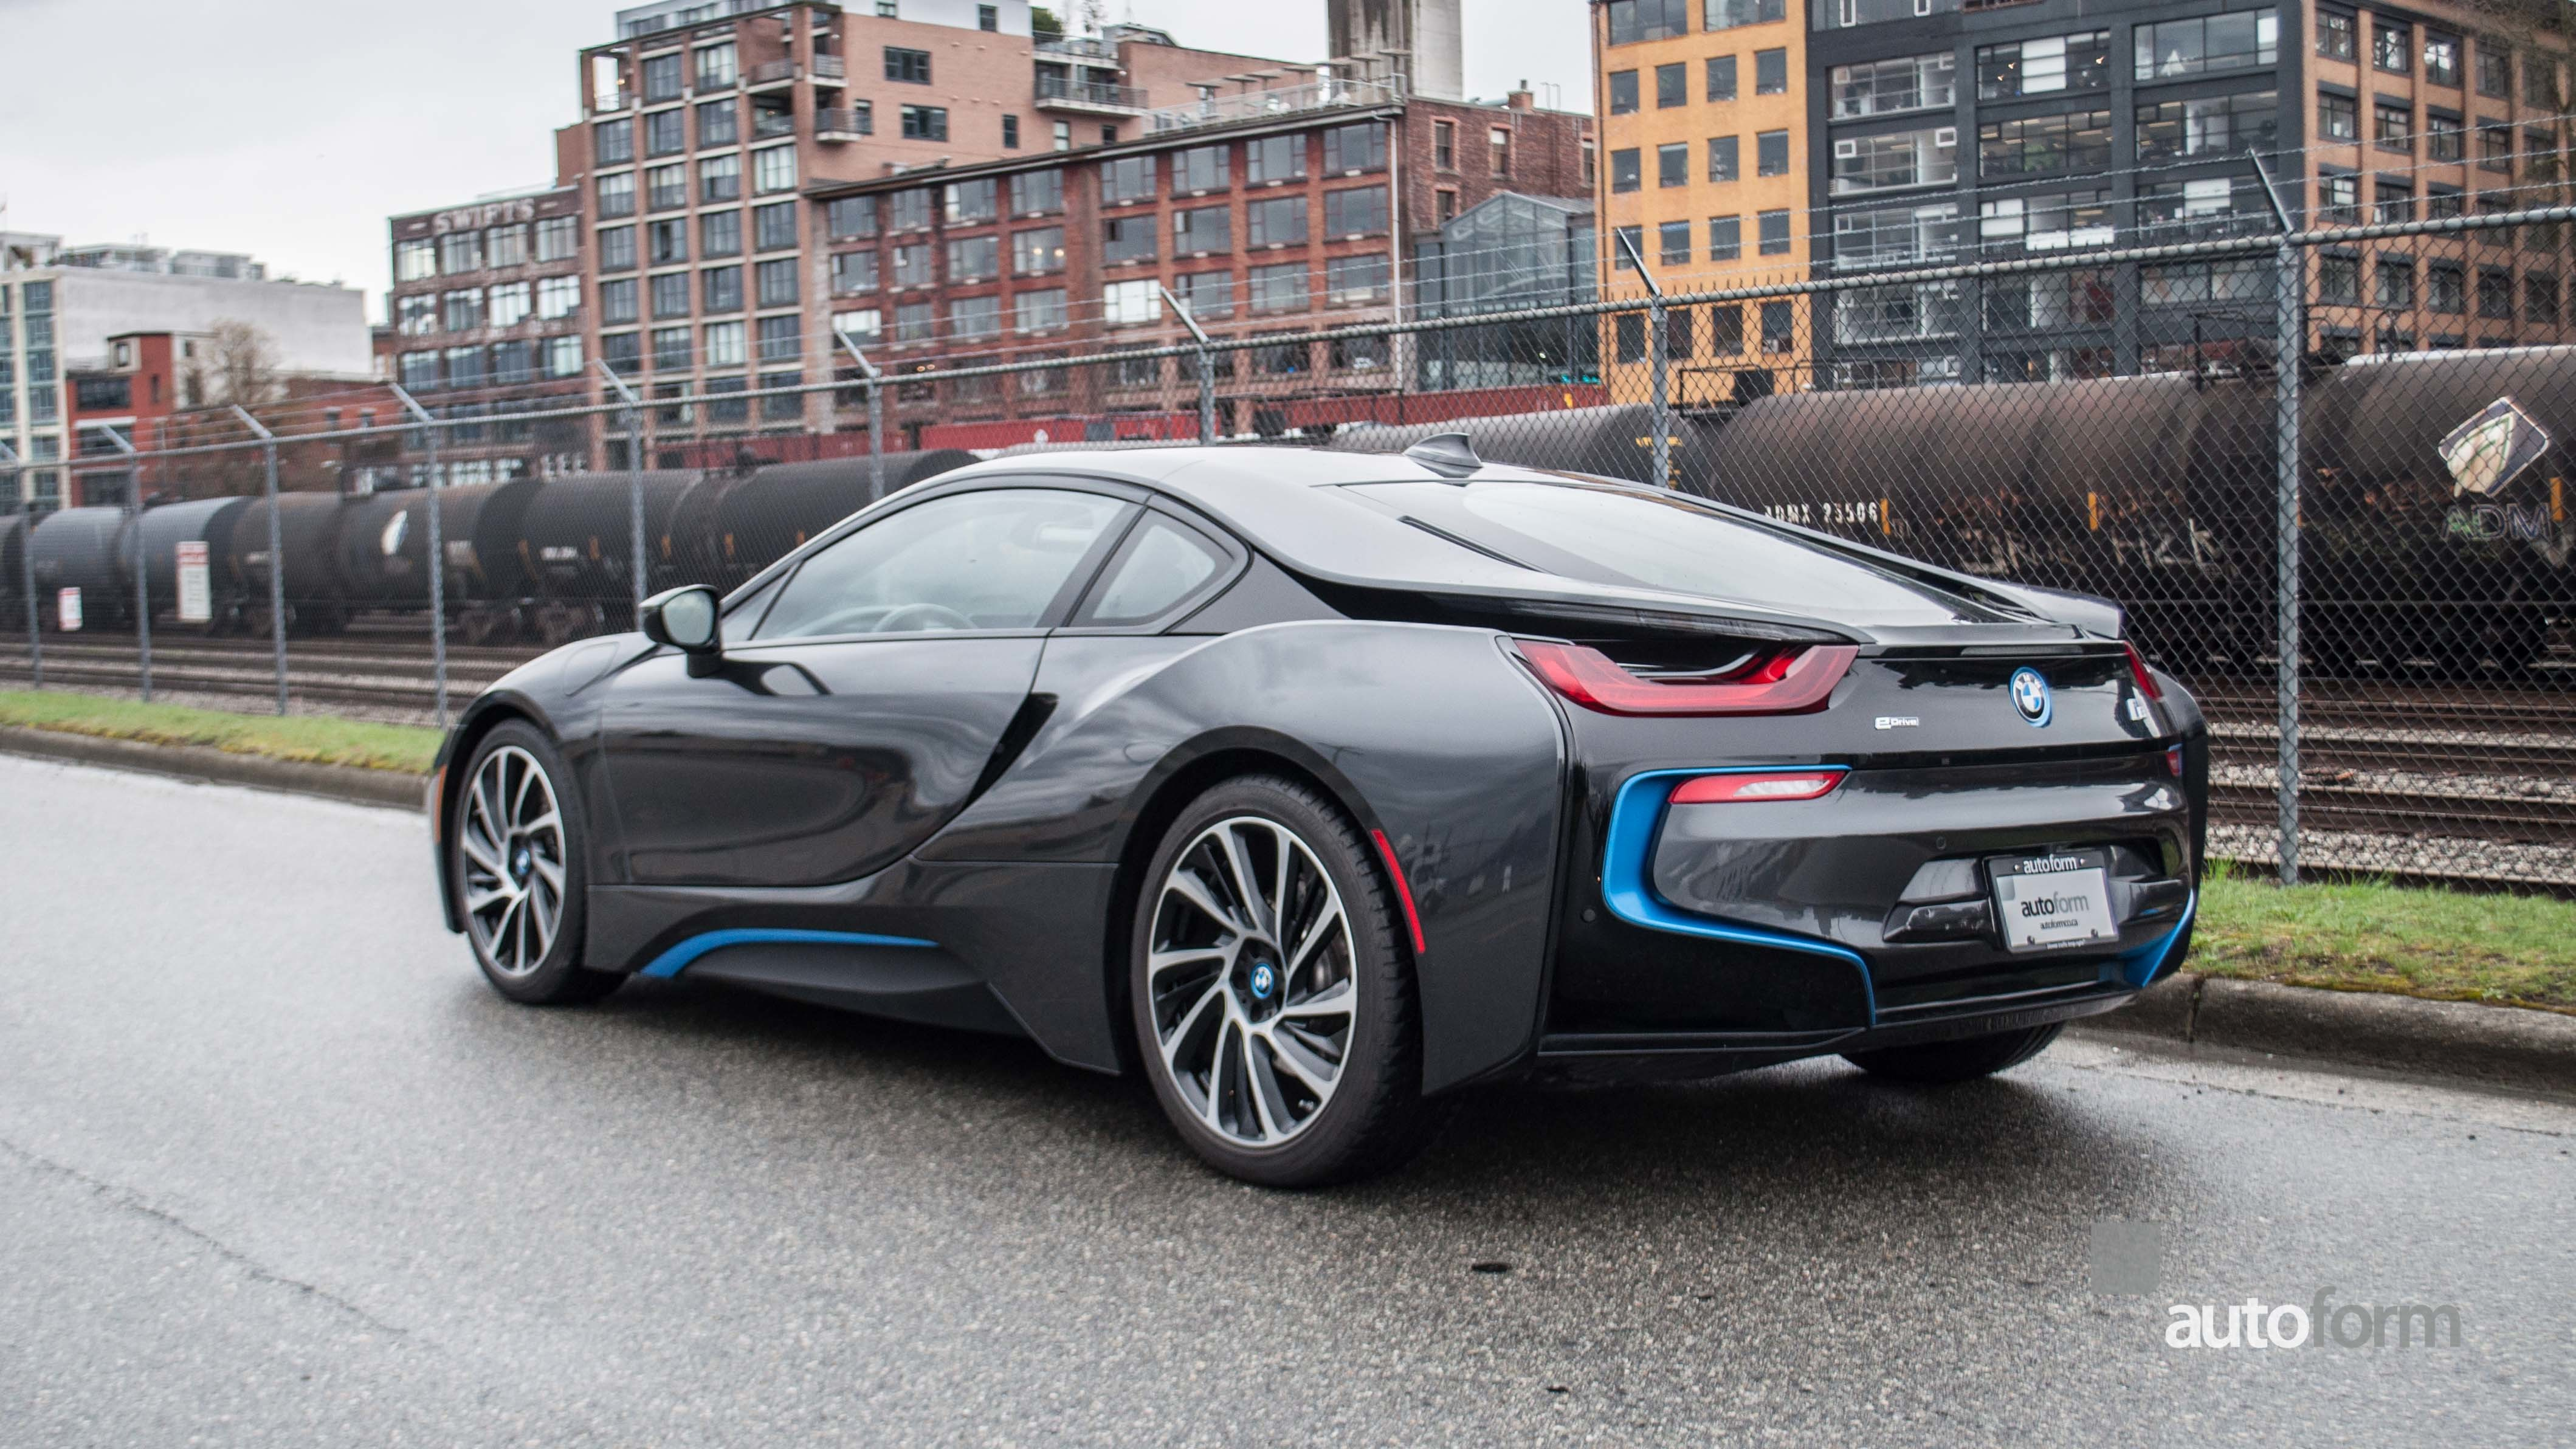 2015 BMW i8 | Autoform